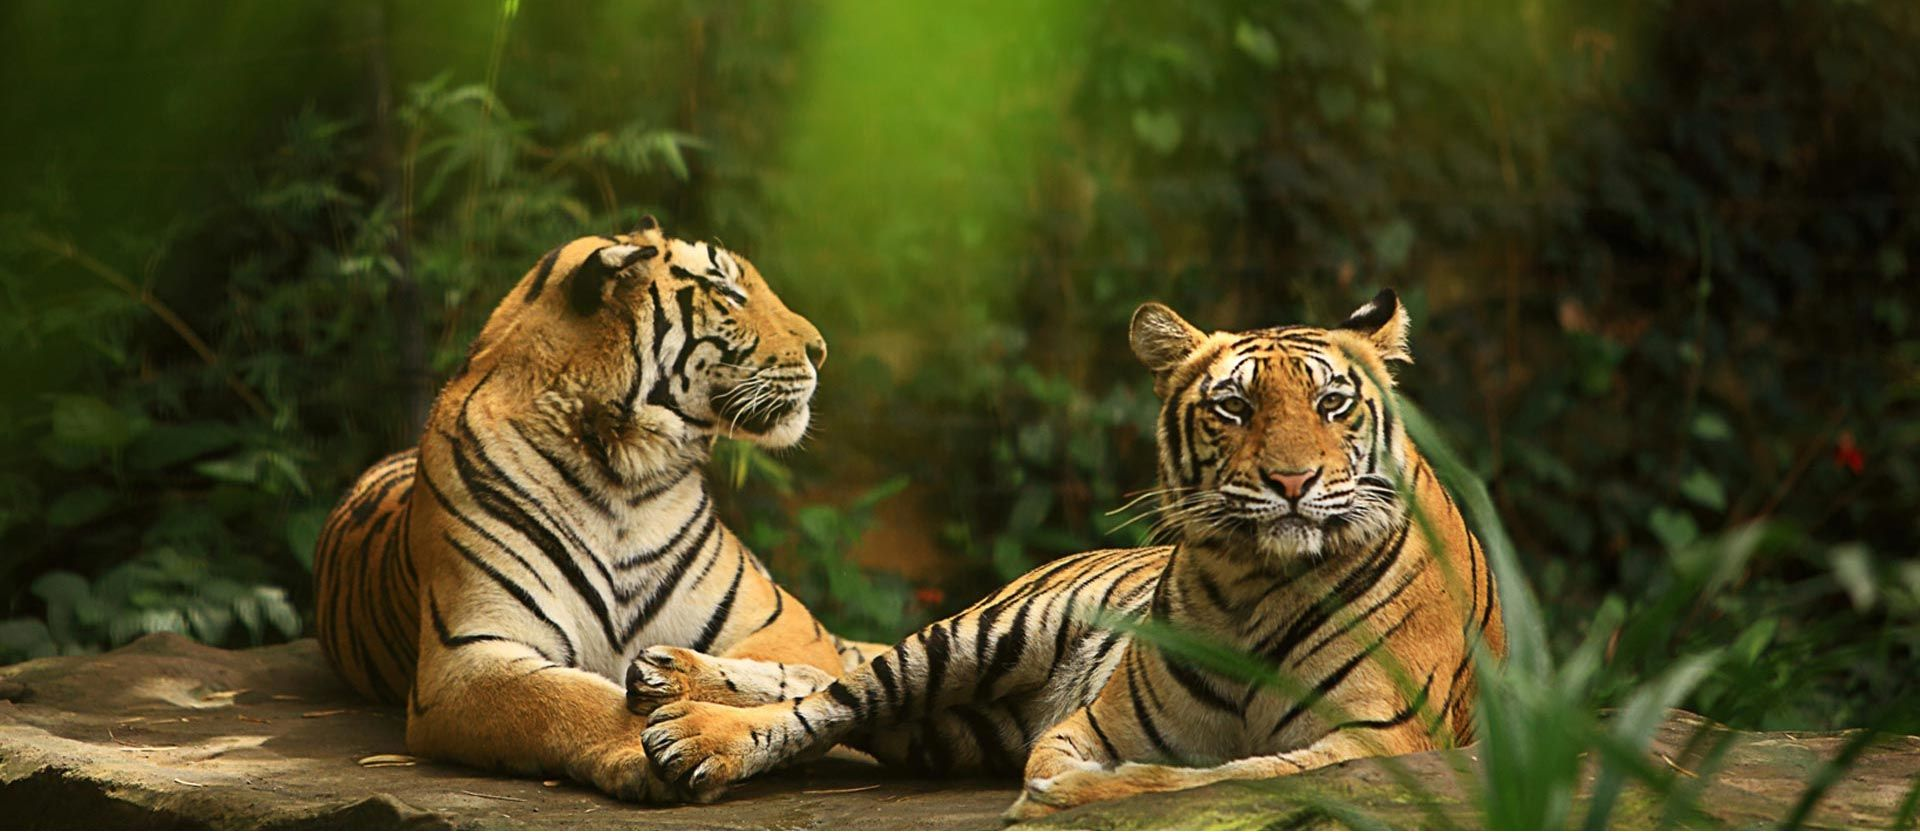 Bali Zoo - Love. Conserve. Share